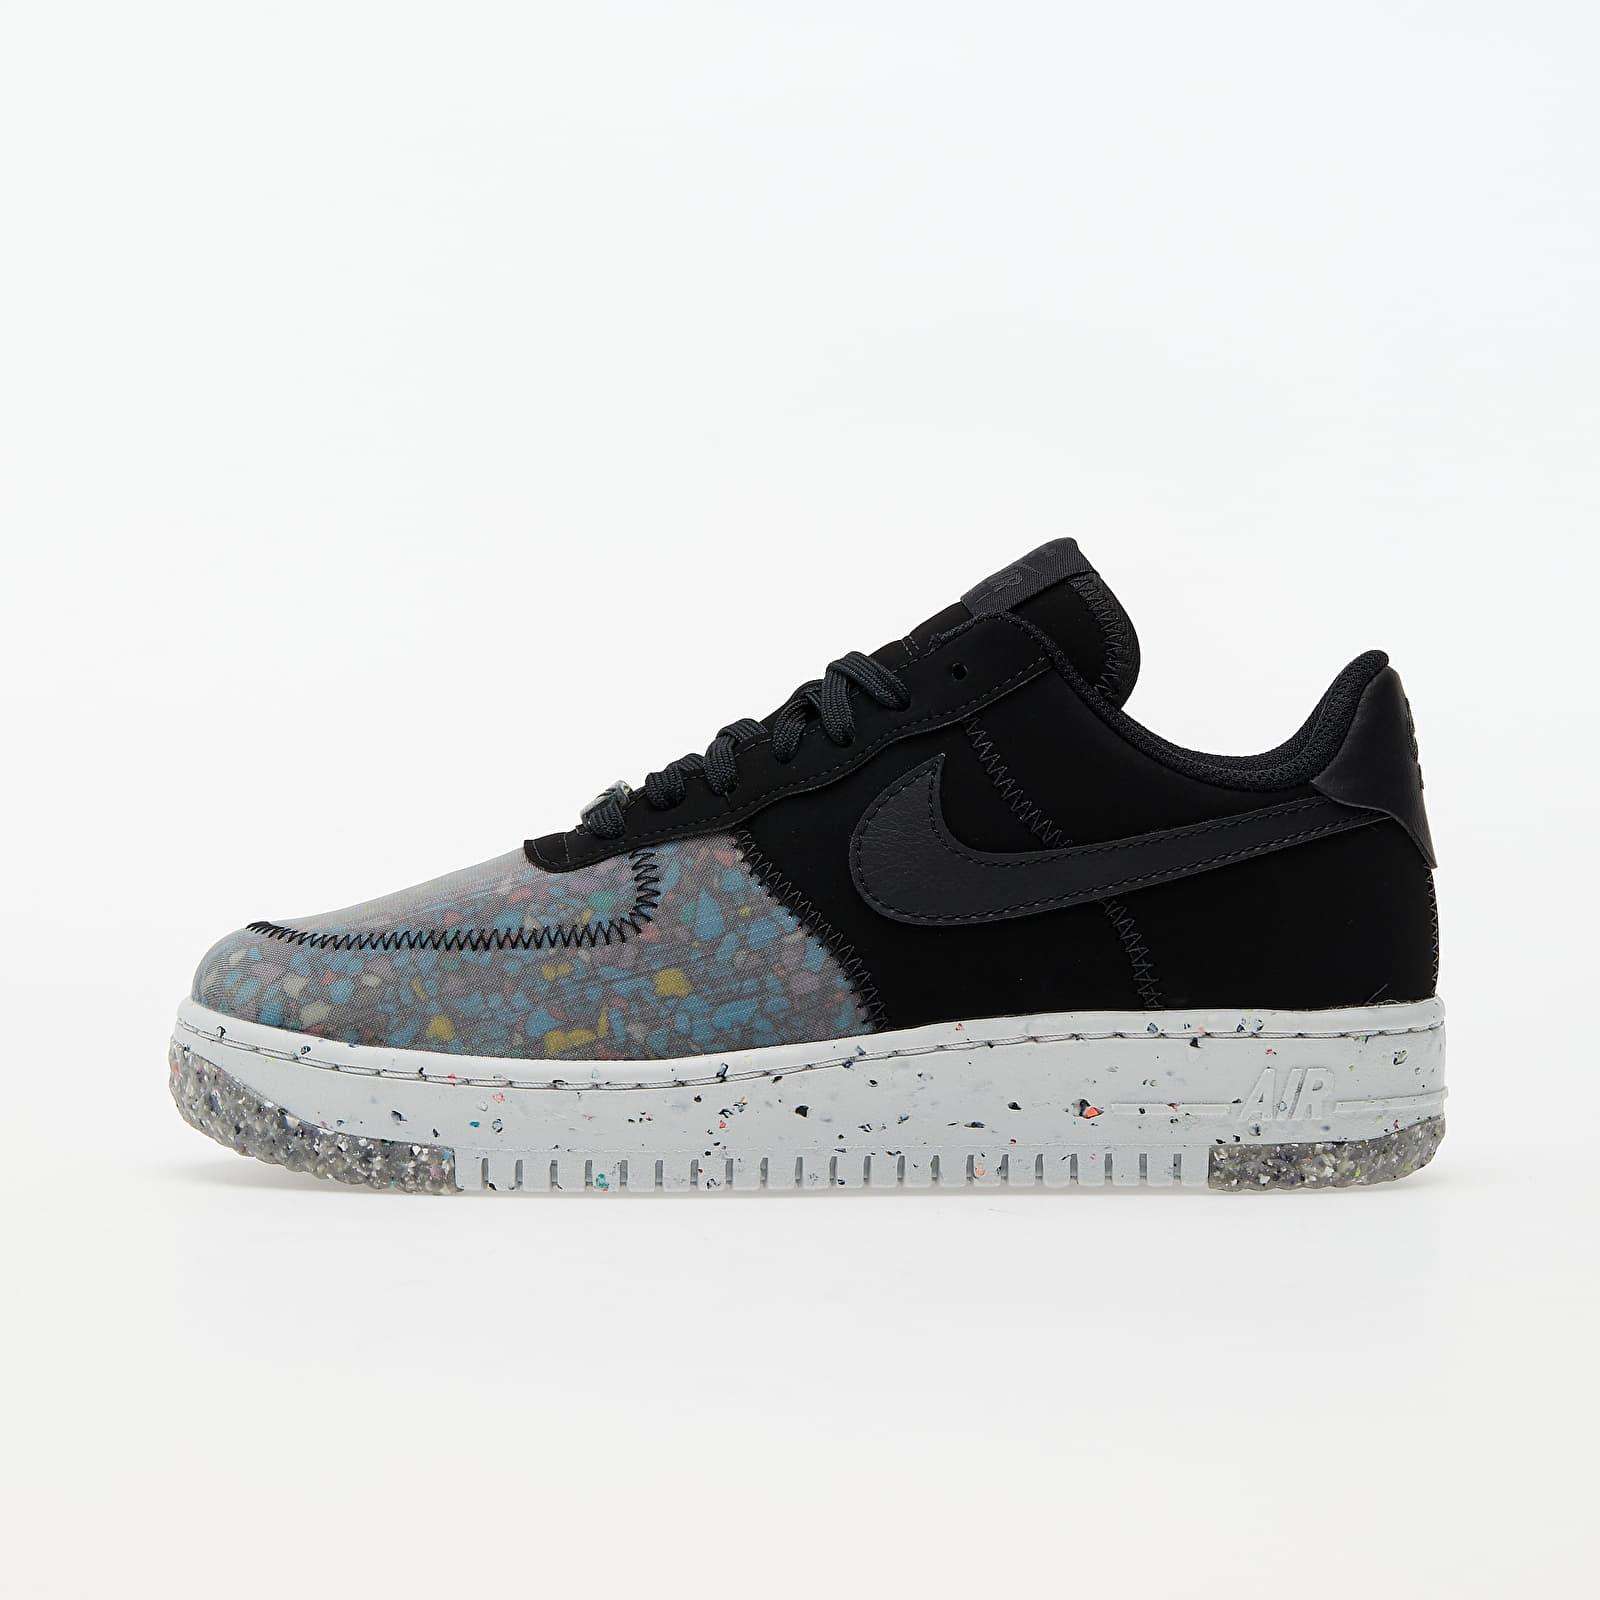 Nike W Air Force 1 Crater Black/ Black-Photon Dust-Dk Smoke Grey EUR 36